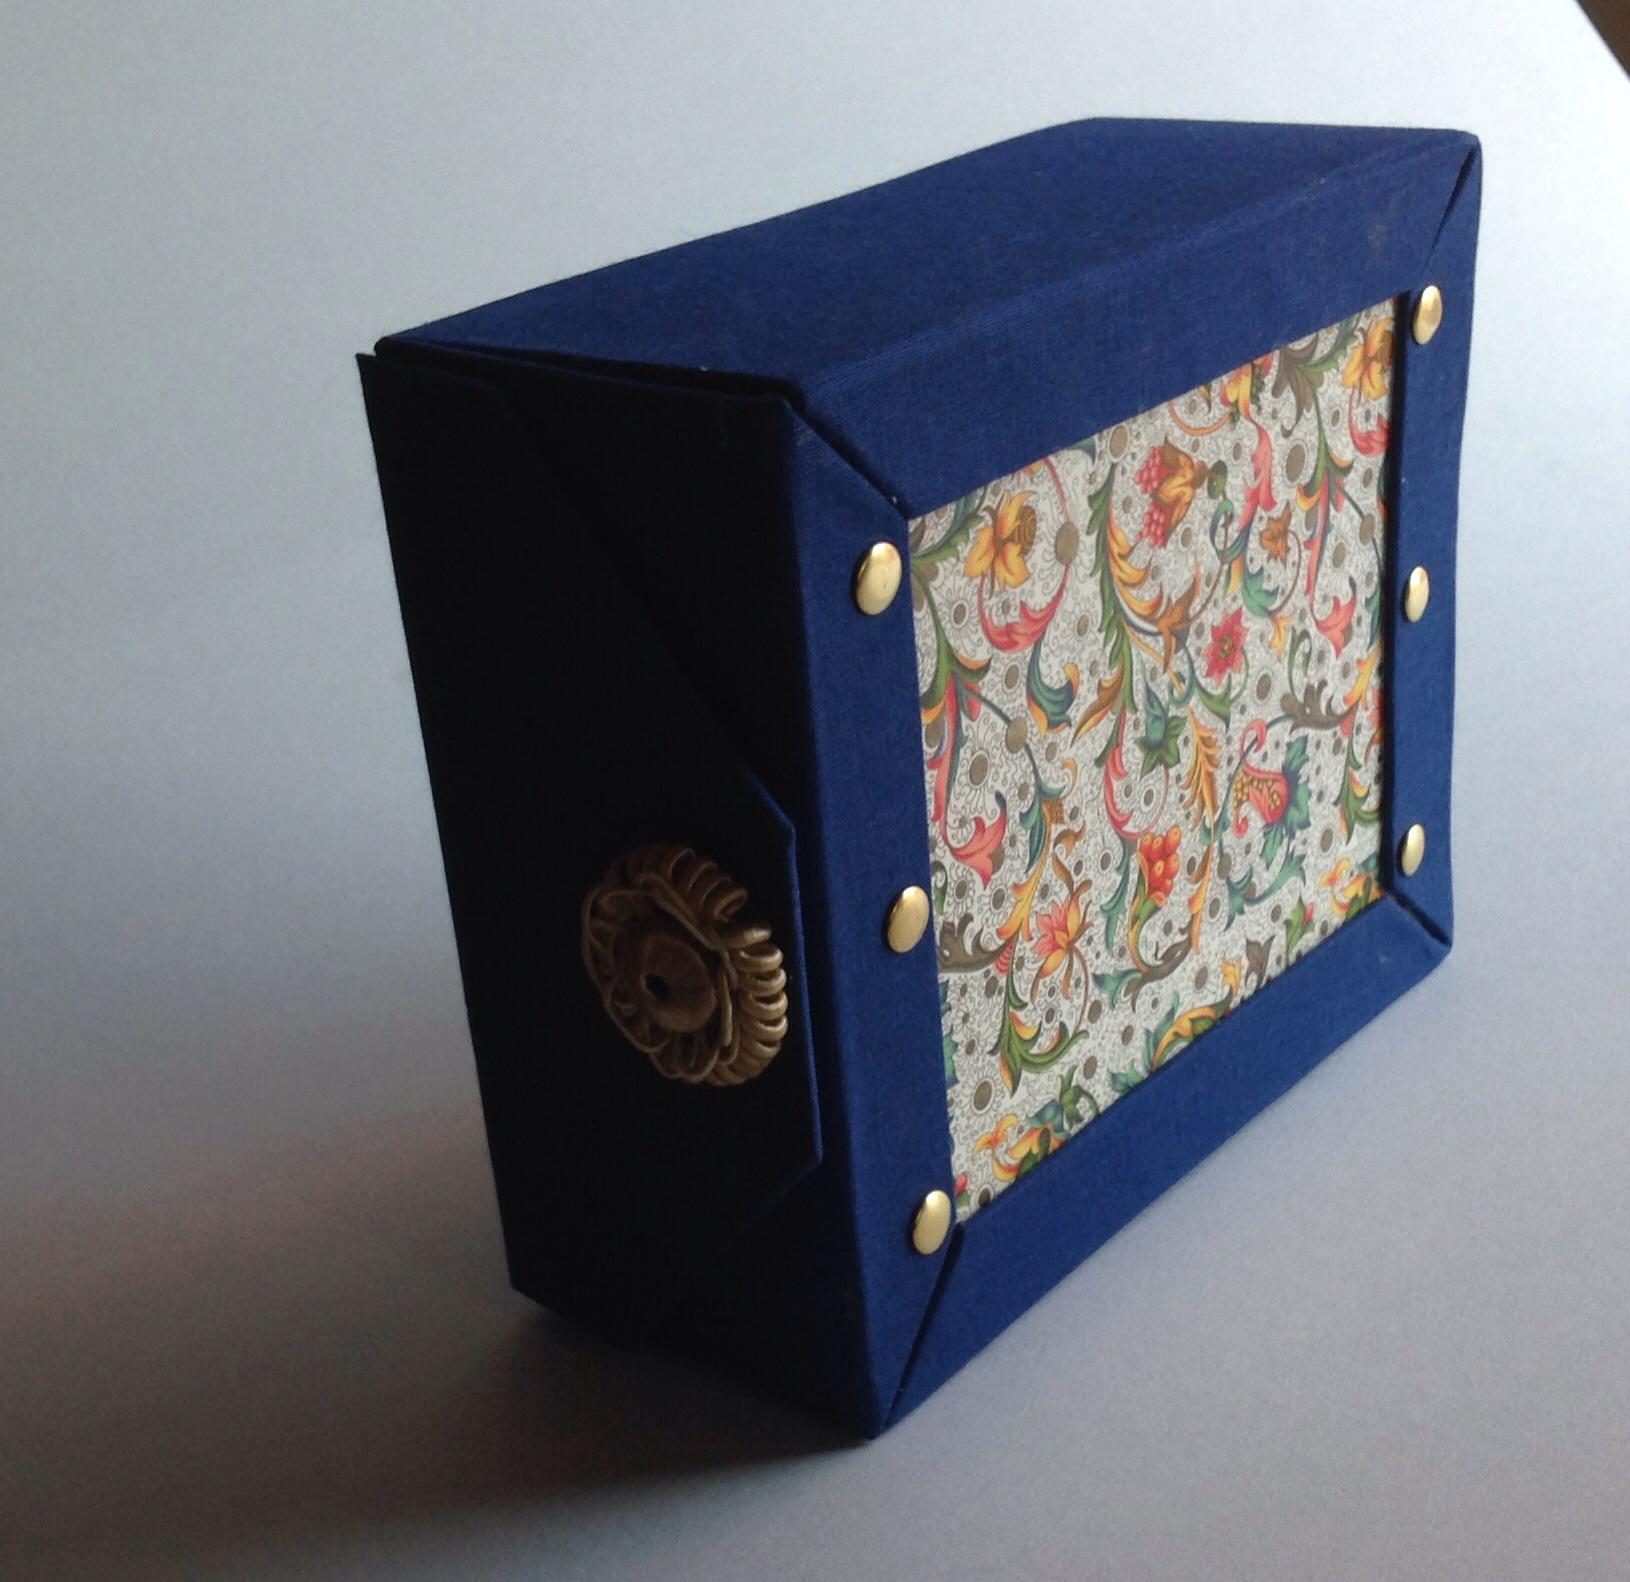 CD binder case